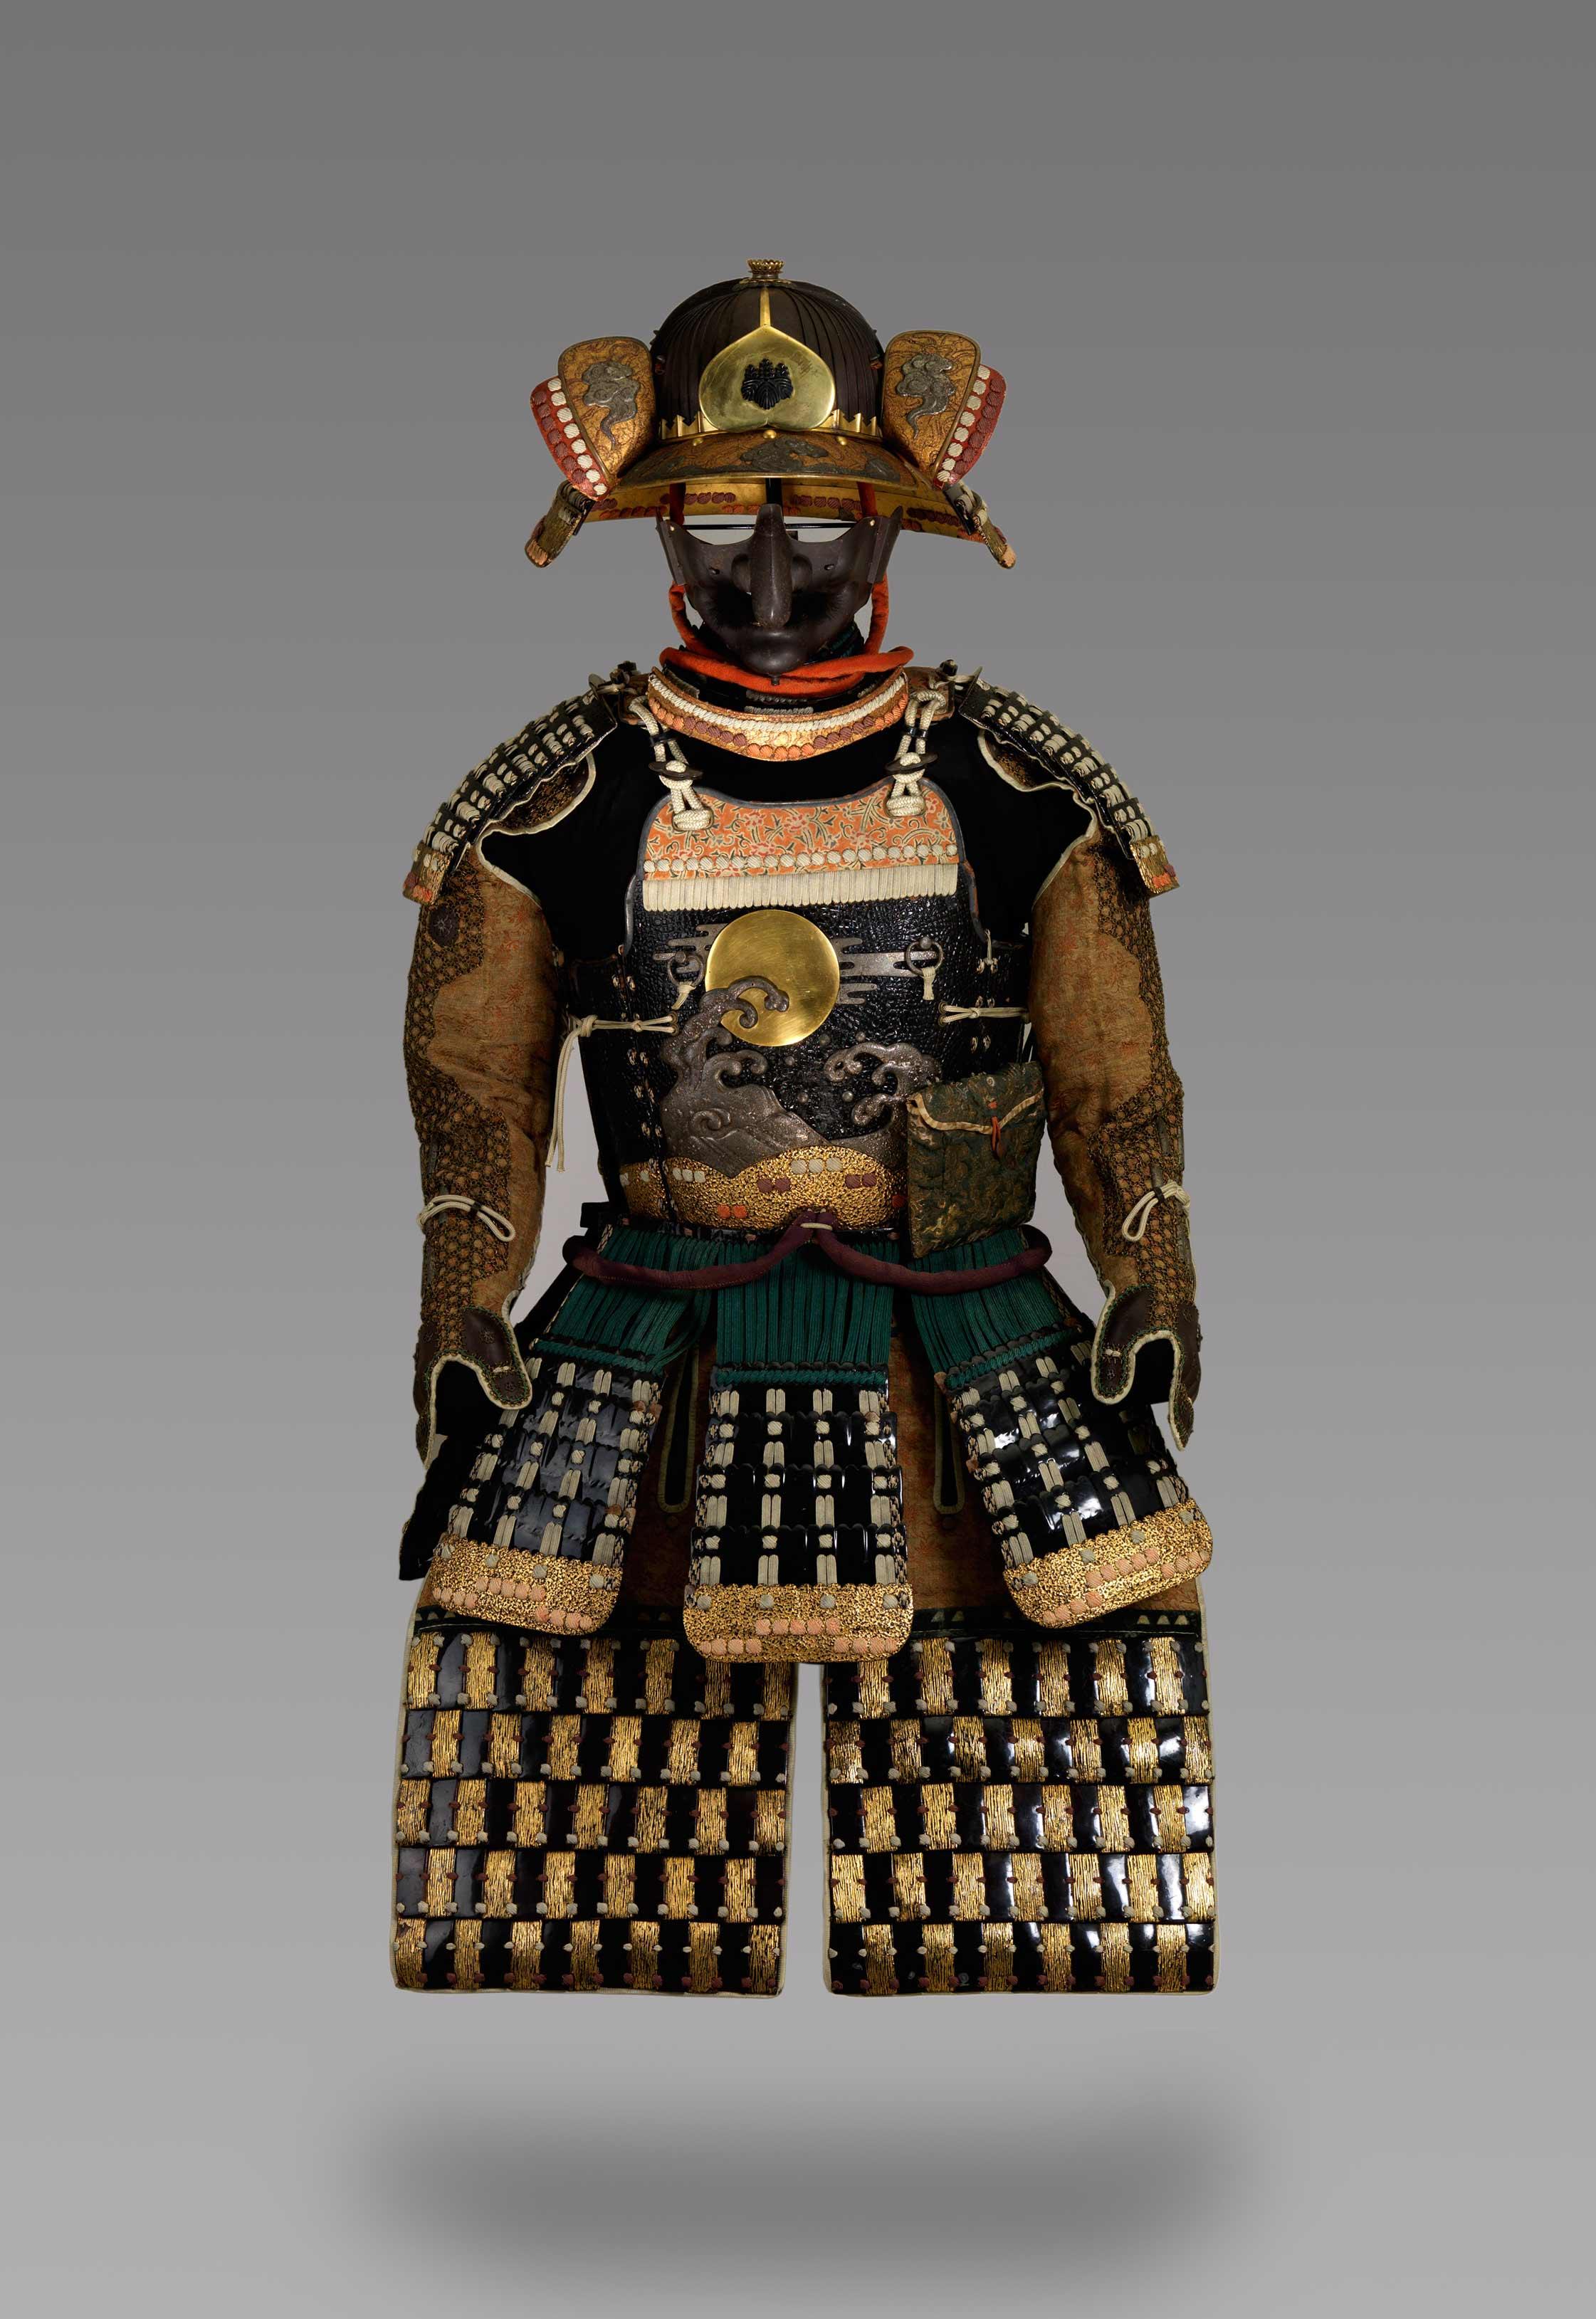 x2012.1---Suit-of-Armor